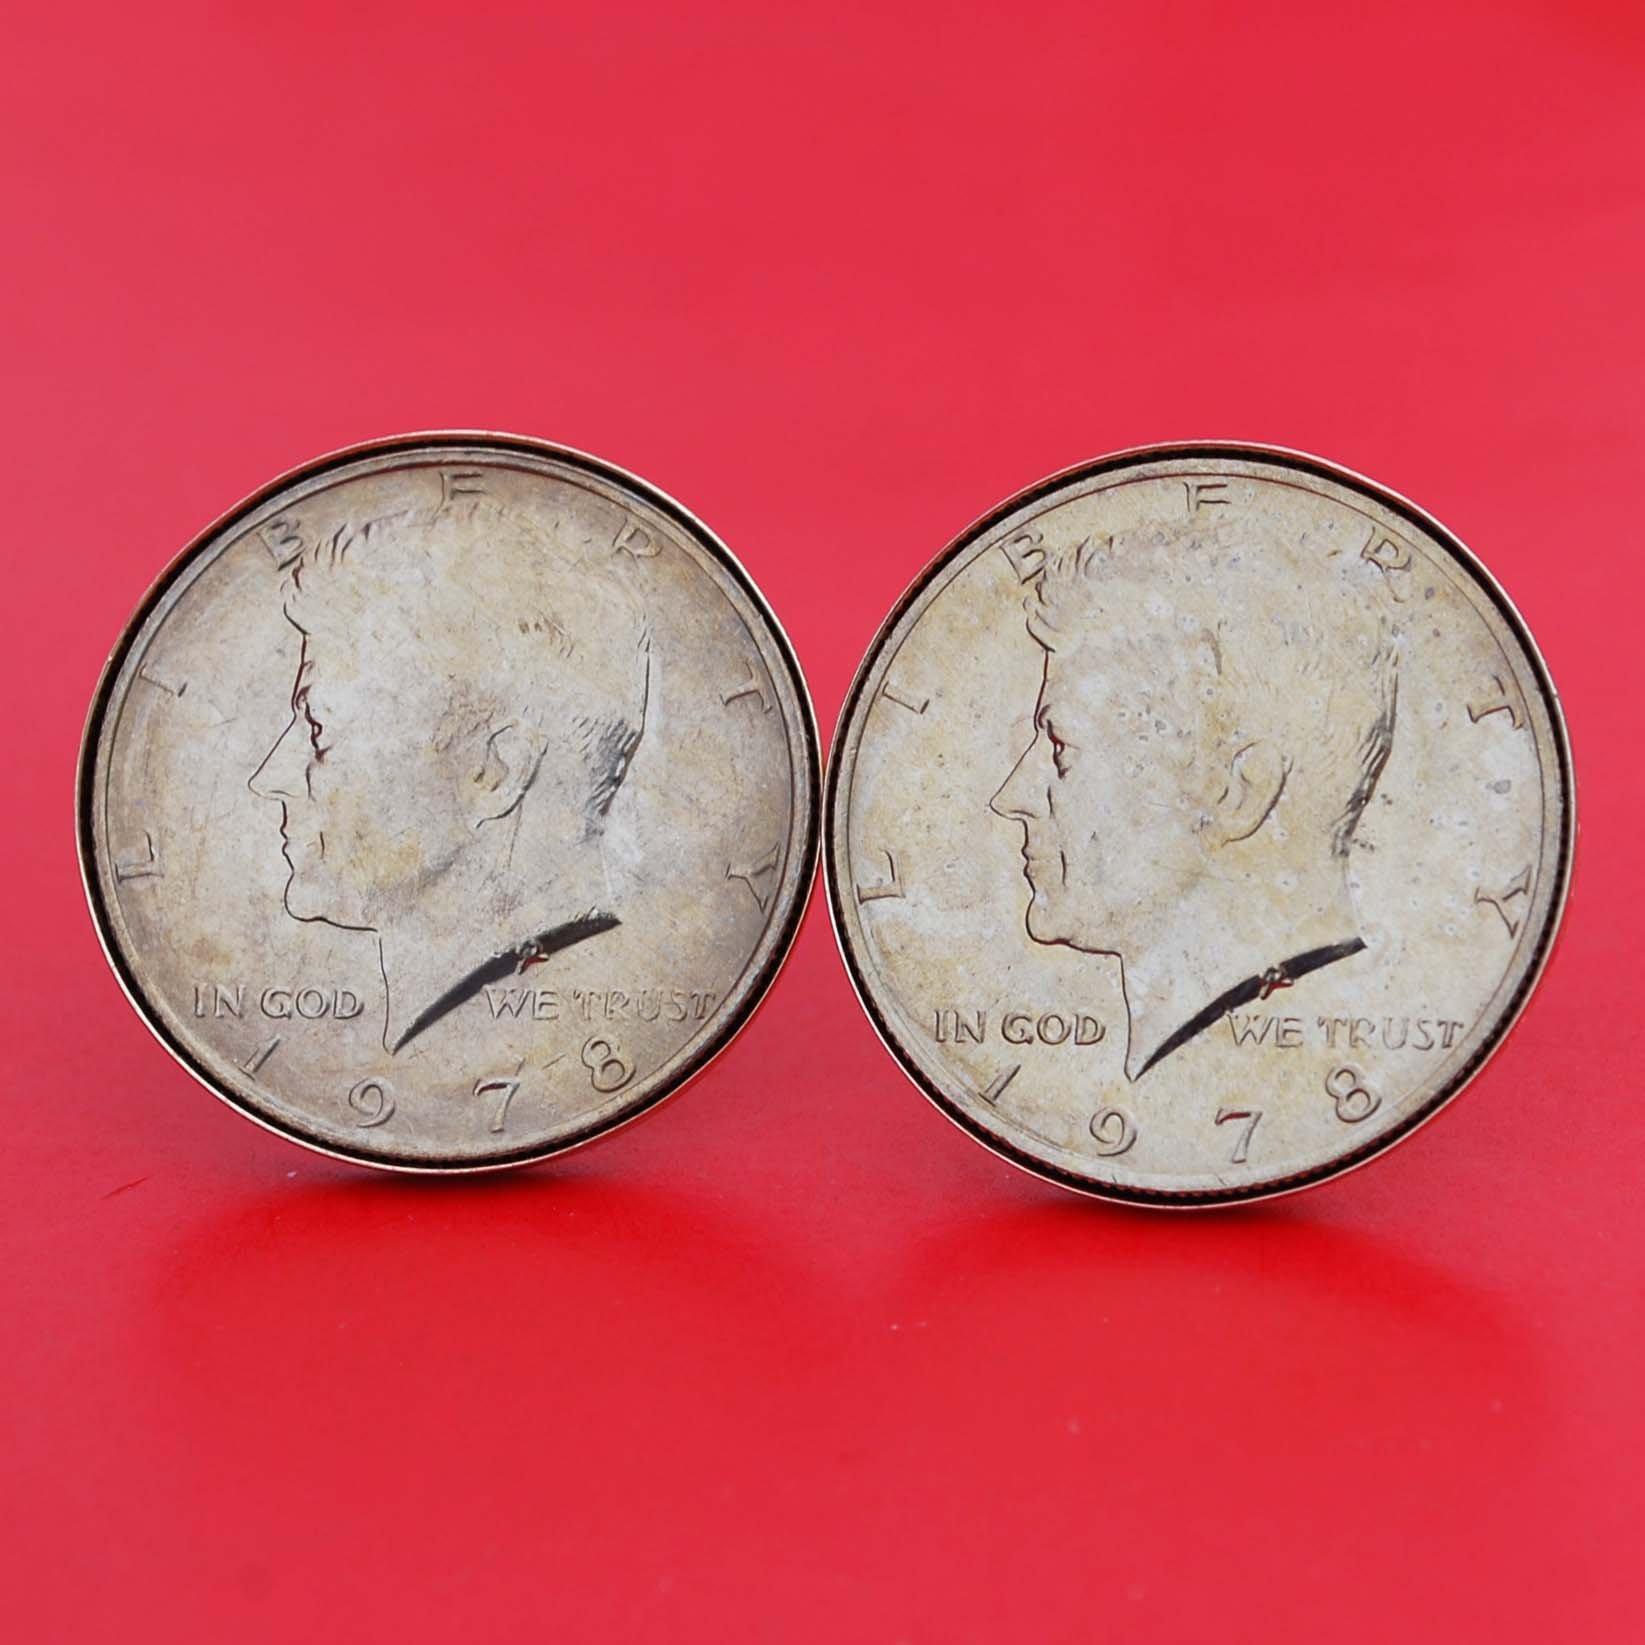 US 1978 Kennedy Half Dollar BU Uncirculated Coin Gold Cufflinks NEW